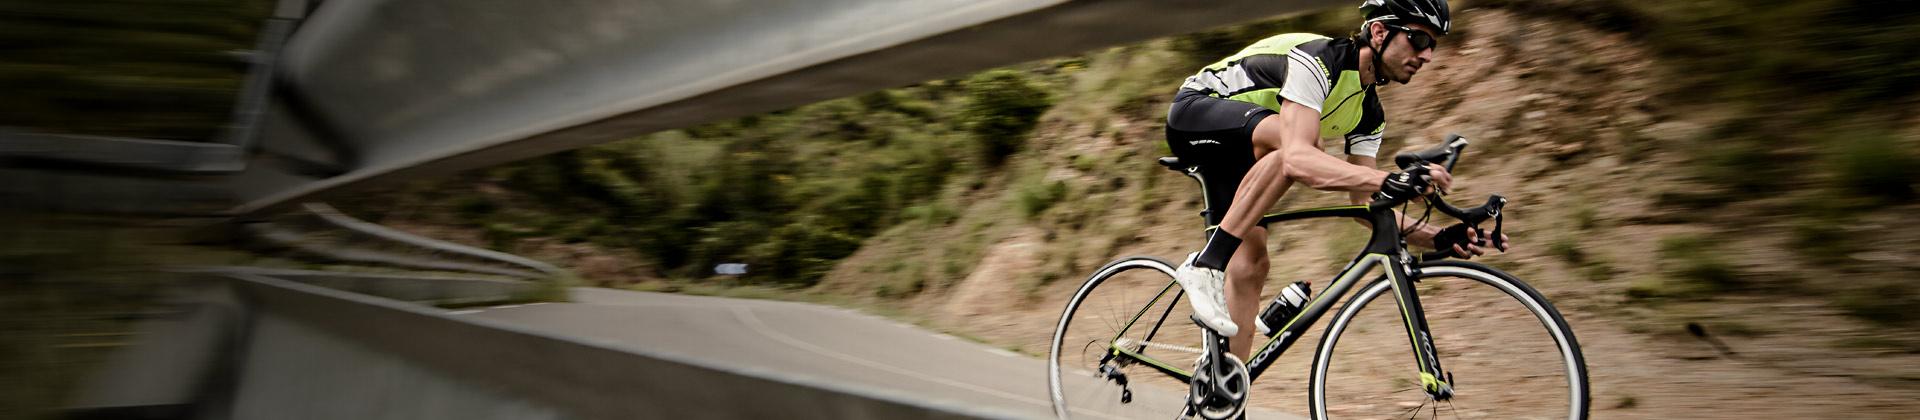 kimera road premium ersatzteile zu dem fahrrad. Black Bedroom Furniture Sets. Home Design Ideas